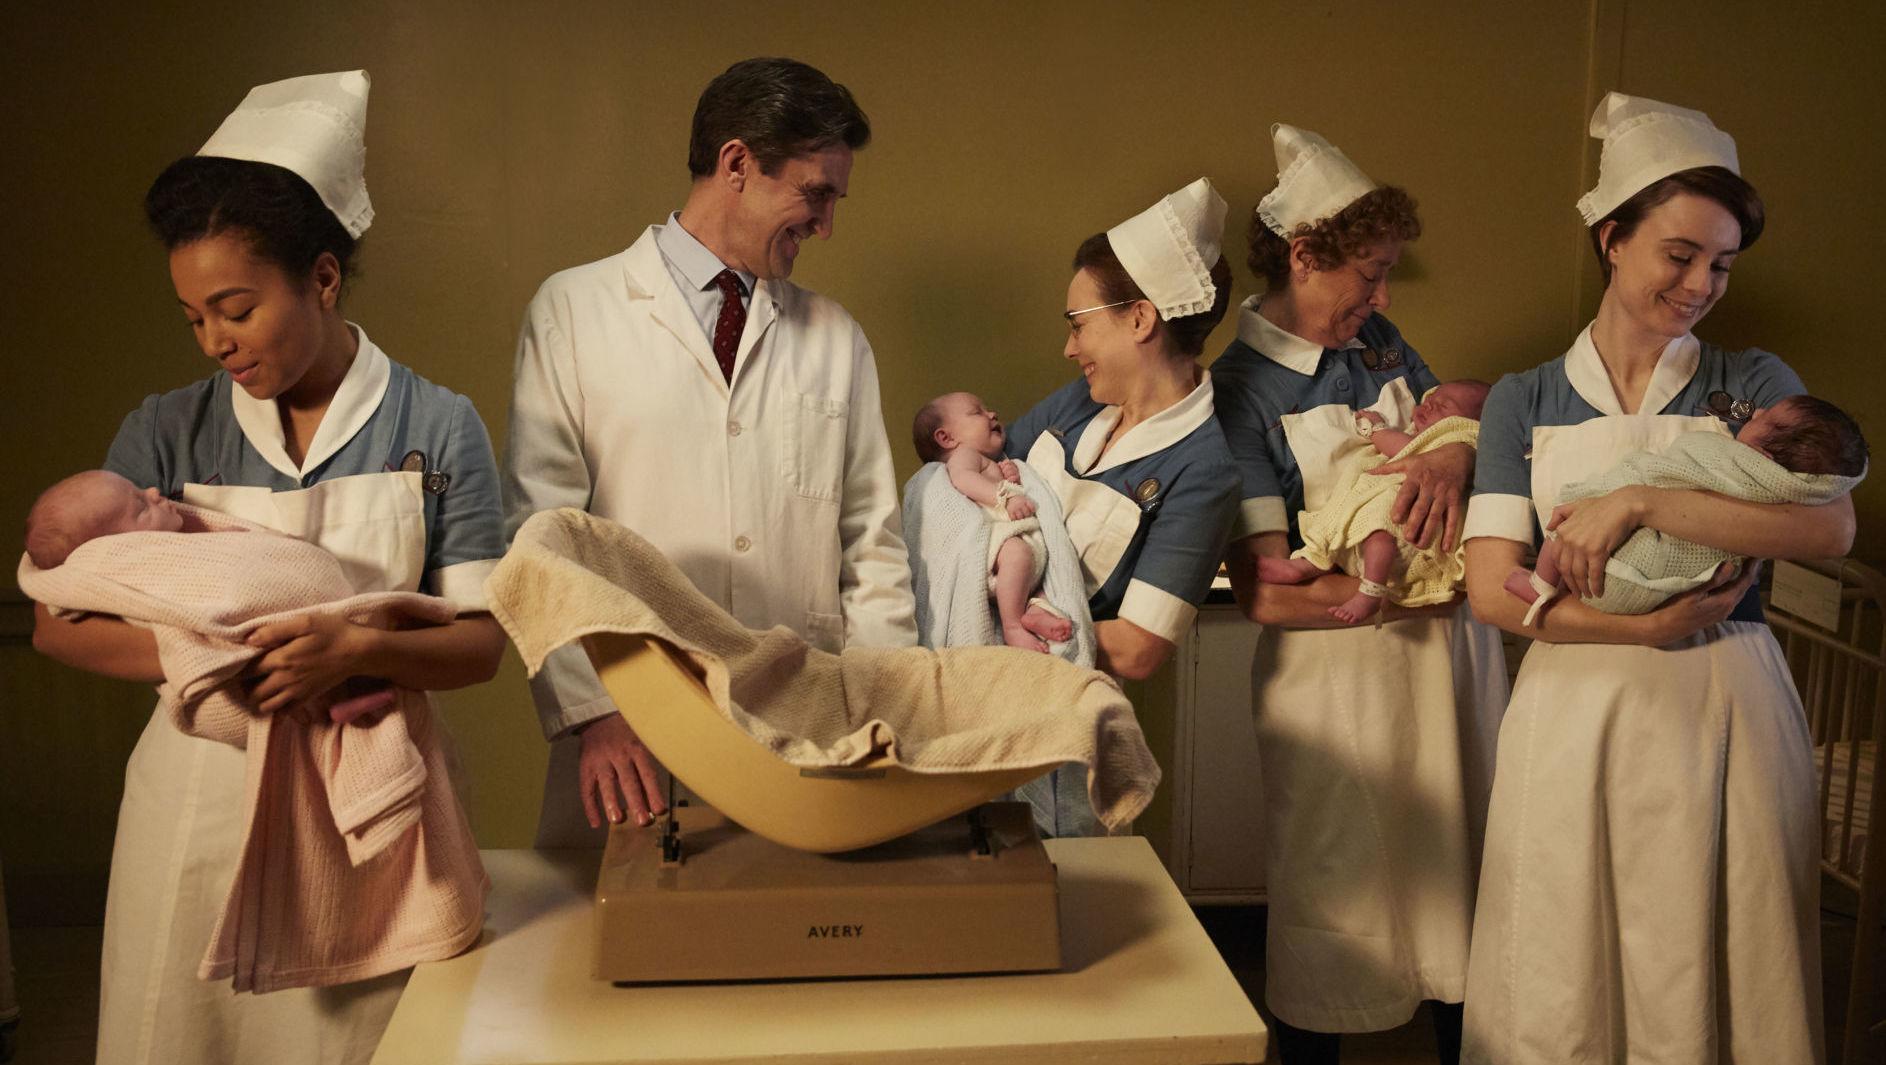 Call the Midwife Season 7 finale. R to L: Nurse Valerie Dyer (JENNIFER KIRBY), Nurse Phyllis Crane (LINDA BASSETT), Shelagh Turner (LAURA MAIN), Dr Turner (STEPHEN McGANN), Nurse Lucille Anderson (LEONIE ELLIOTT)